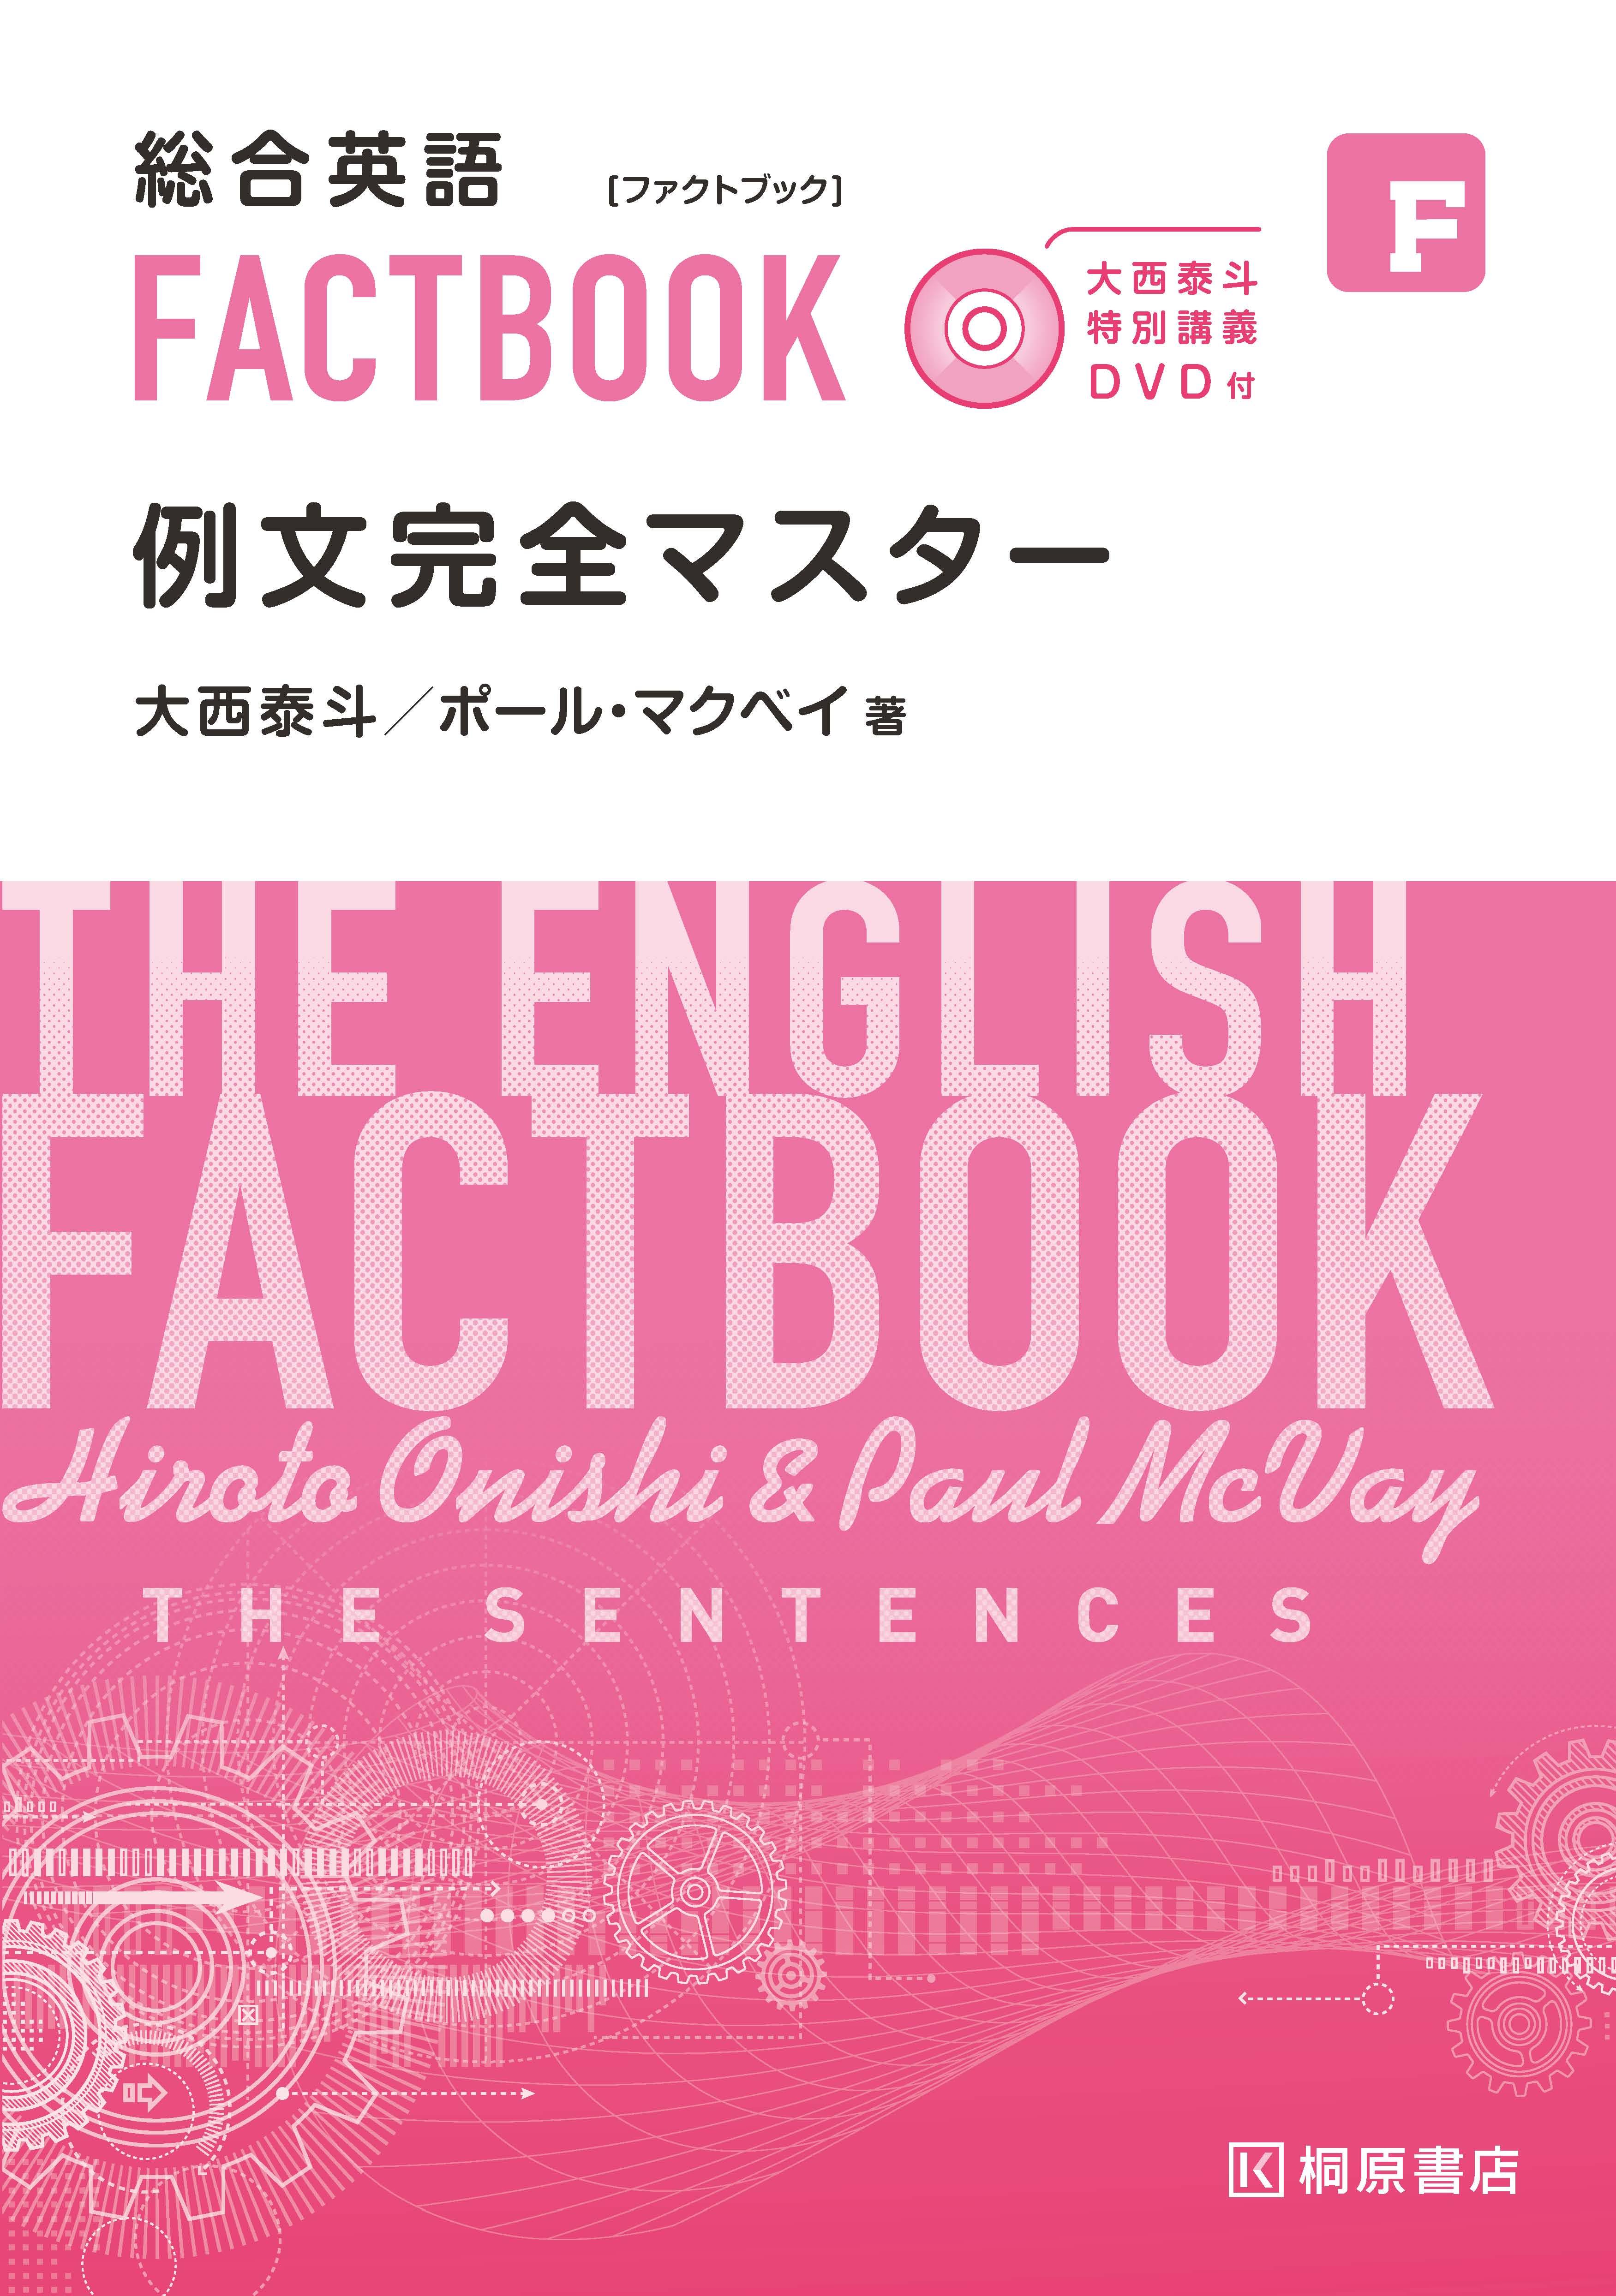 『大西泰斗 特別講義DVD付 総合英語FACTBOOK 例文完全マスター』